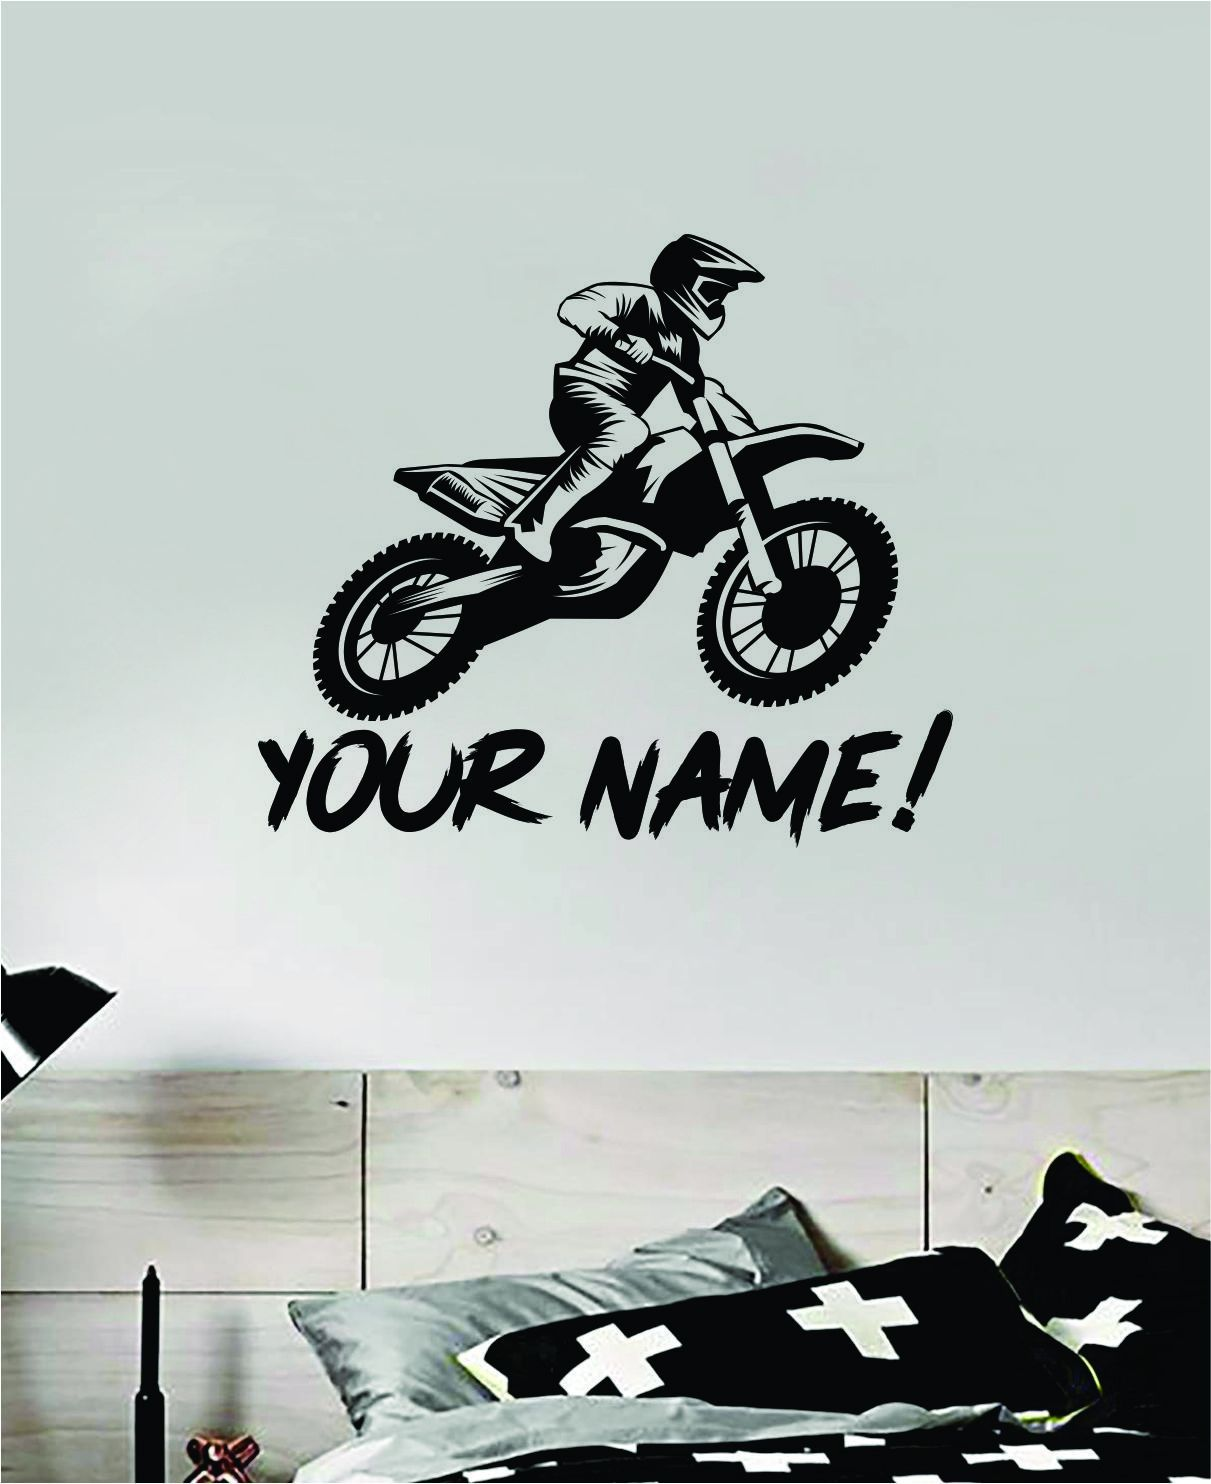 Custom Dirtbike Name Sports Decal Sticker Bedroom Room Wall Vinyl Art Home Decor Teen Kids Nursery Sports Moto X Rider Biker BMX Dirtbiker Customized Personalized - grey